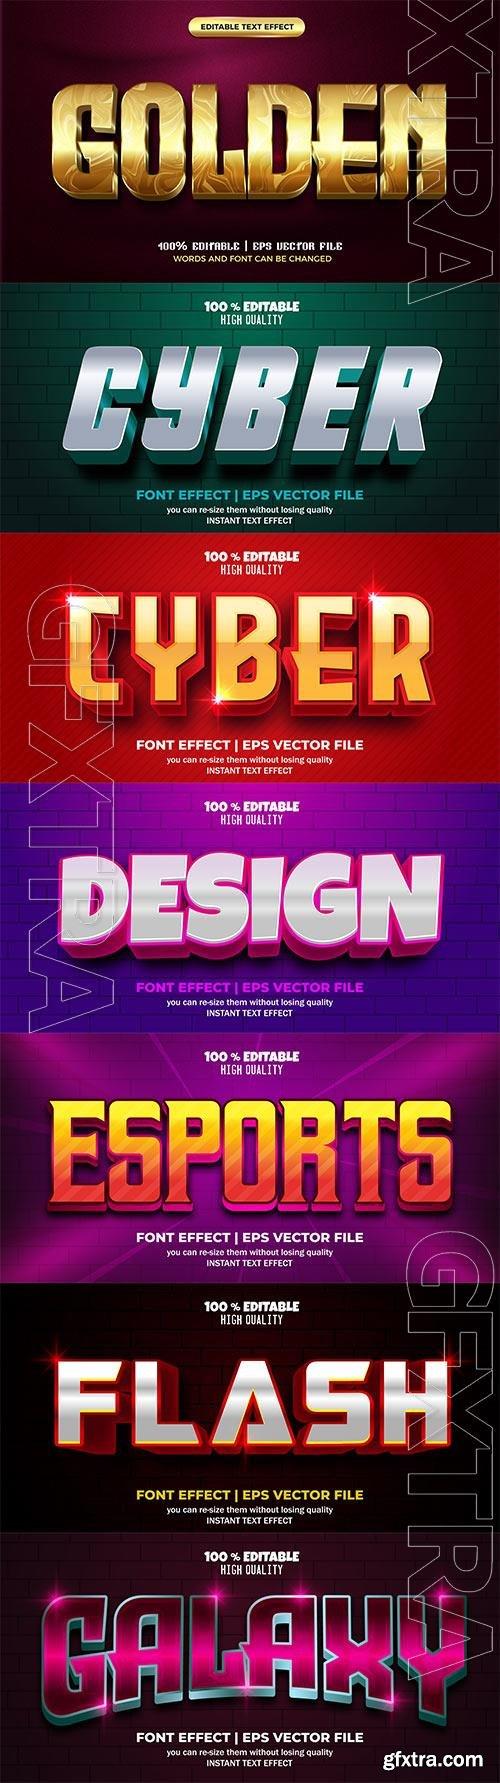 Set 3d editable text style effect vector vol 176